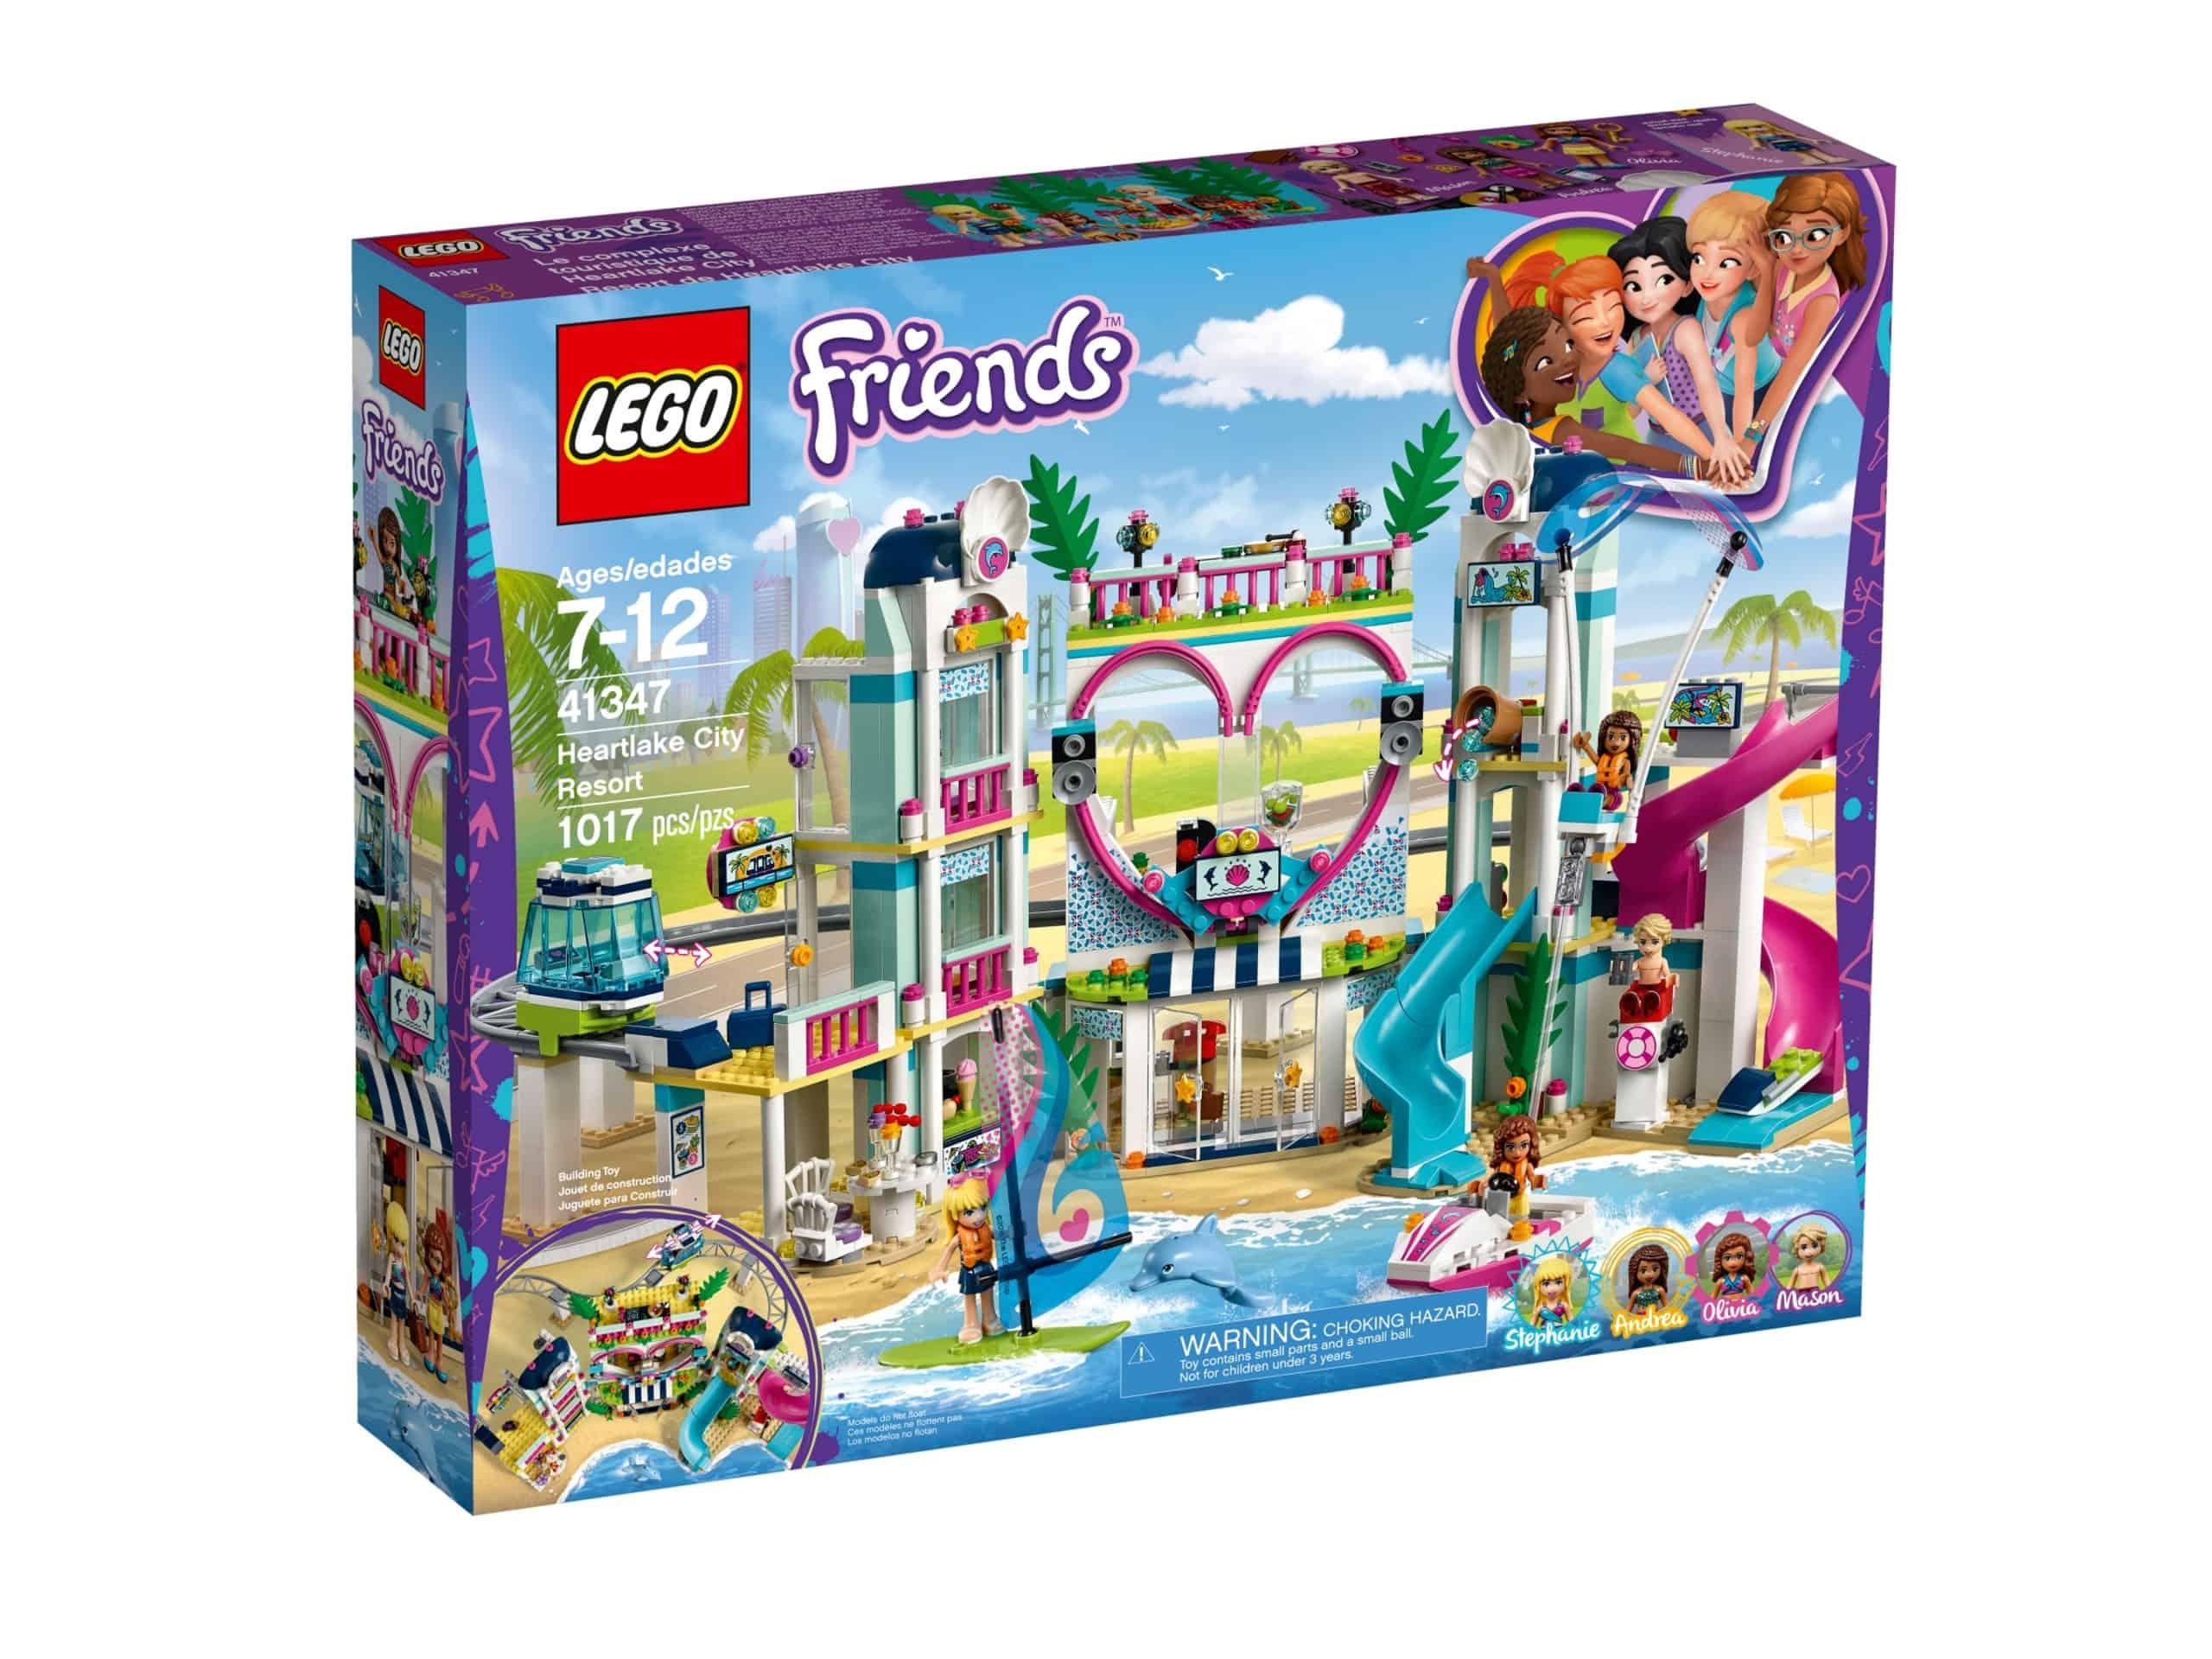 lego 41347 heartlake city resort scaled